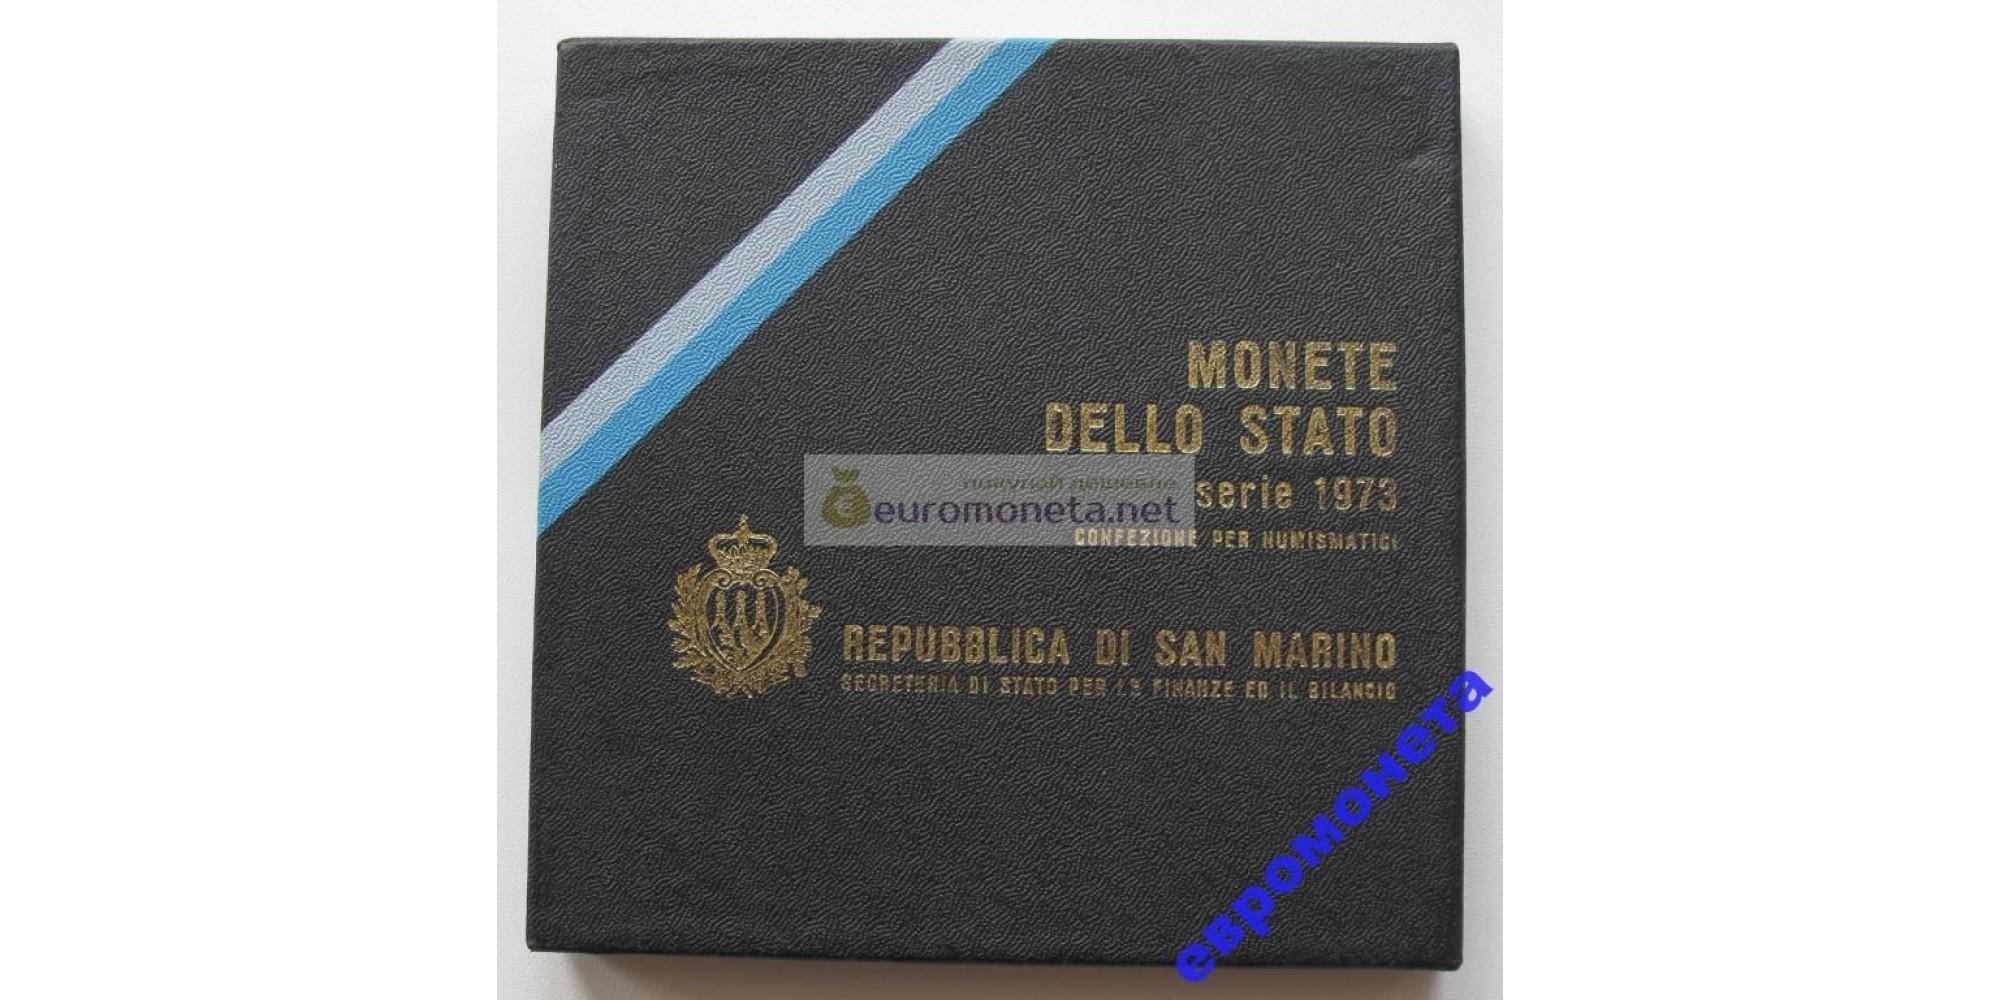 Сан-Марино набор монет 1973 год 8 монет включая 500 лир серебро UNC